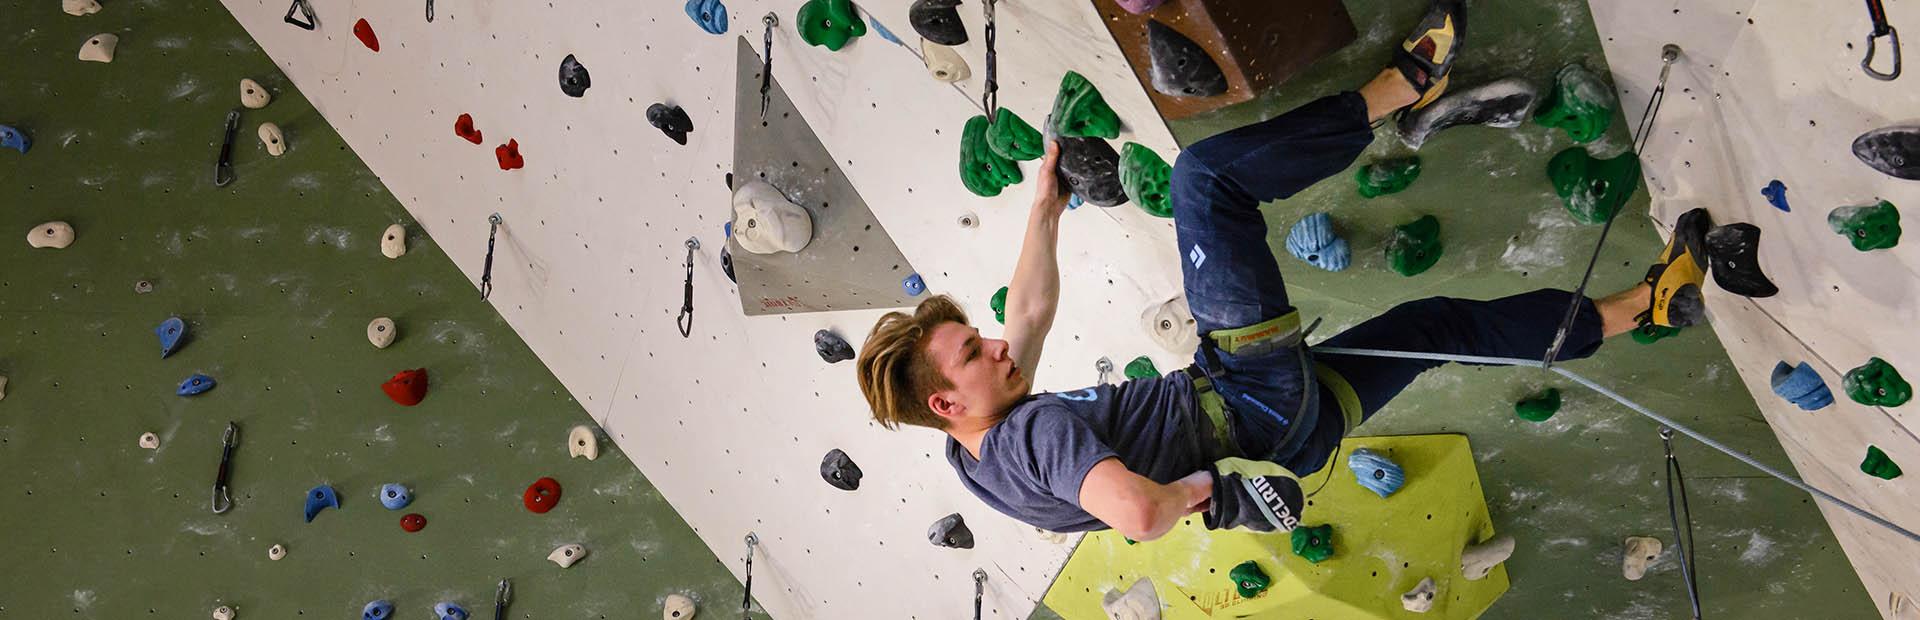 Junger-Kletterer